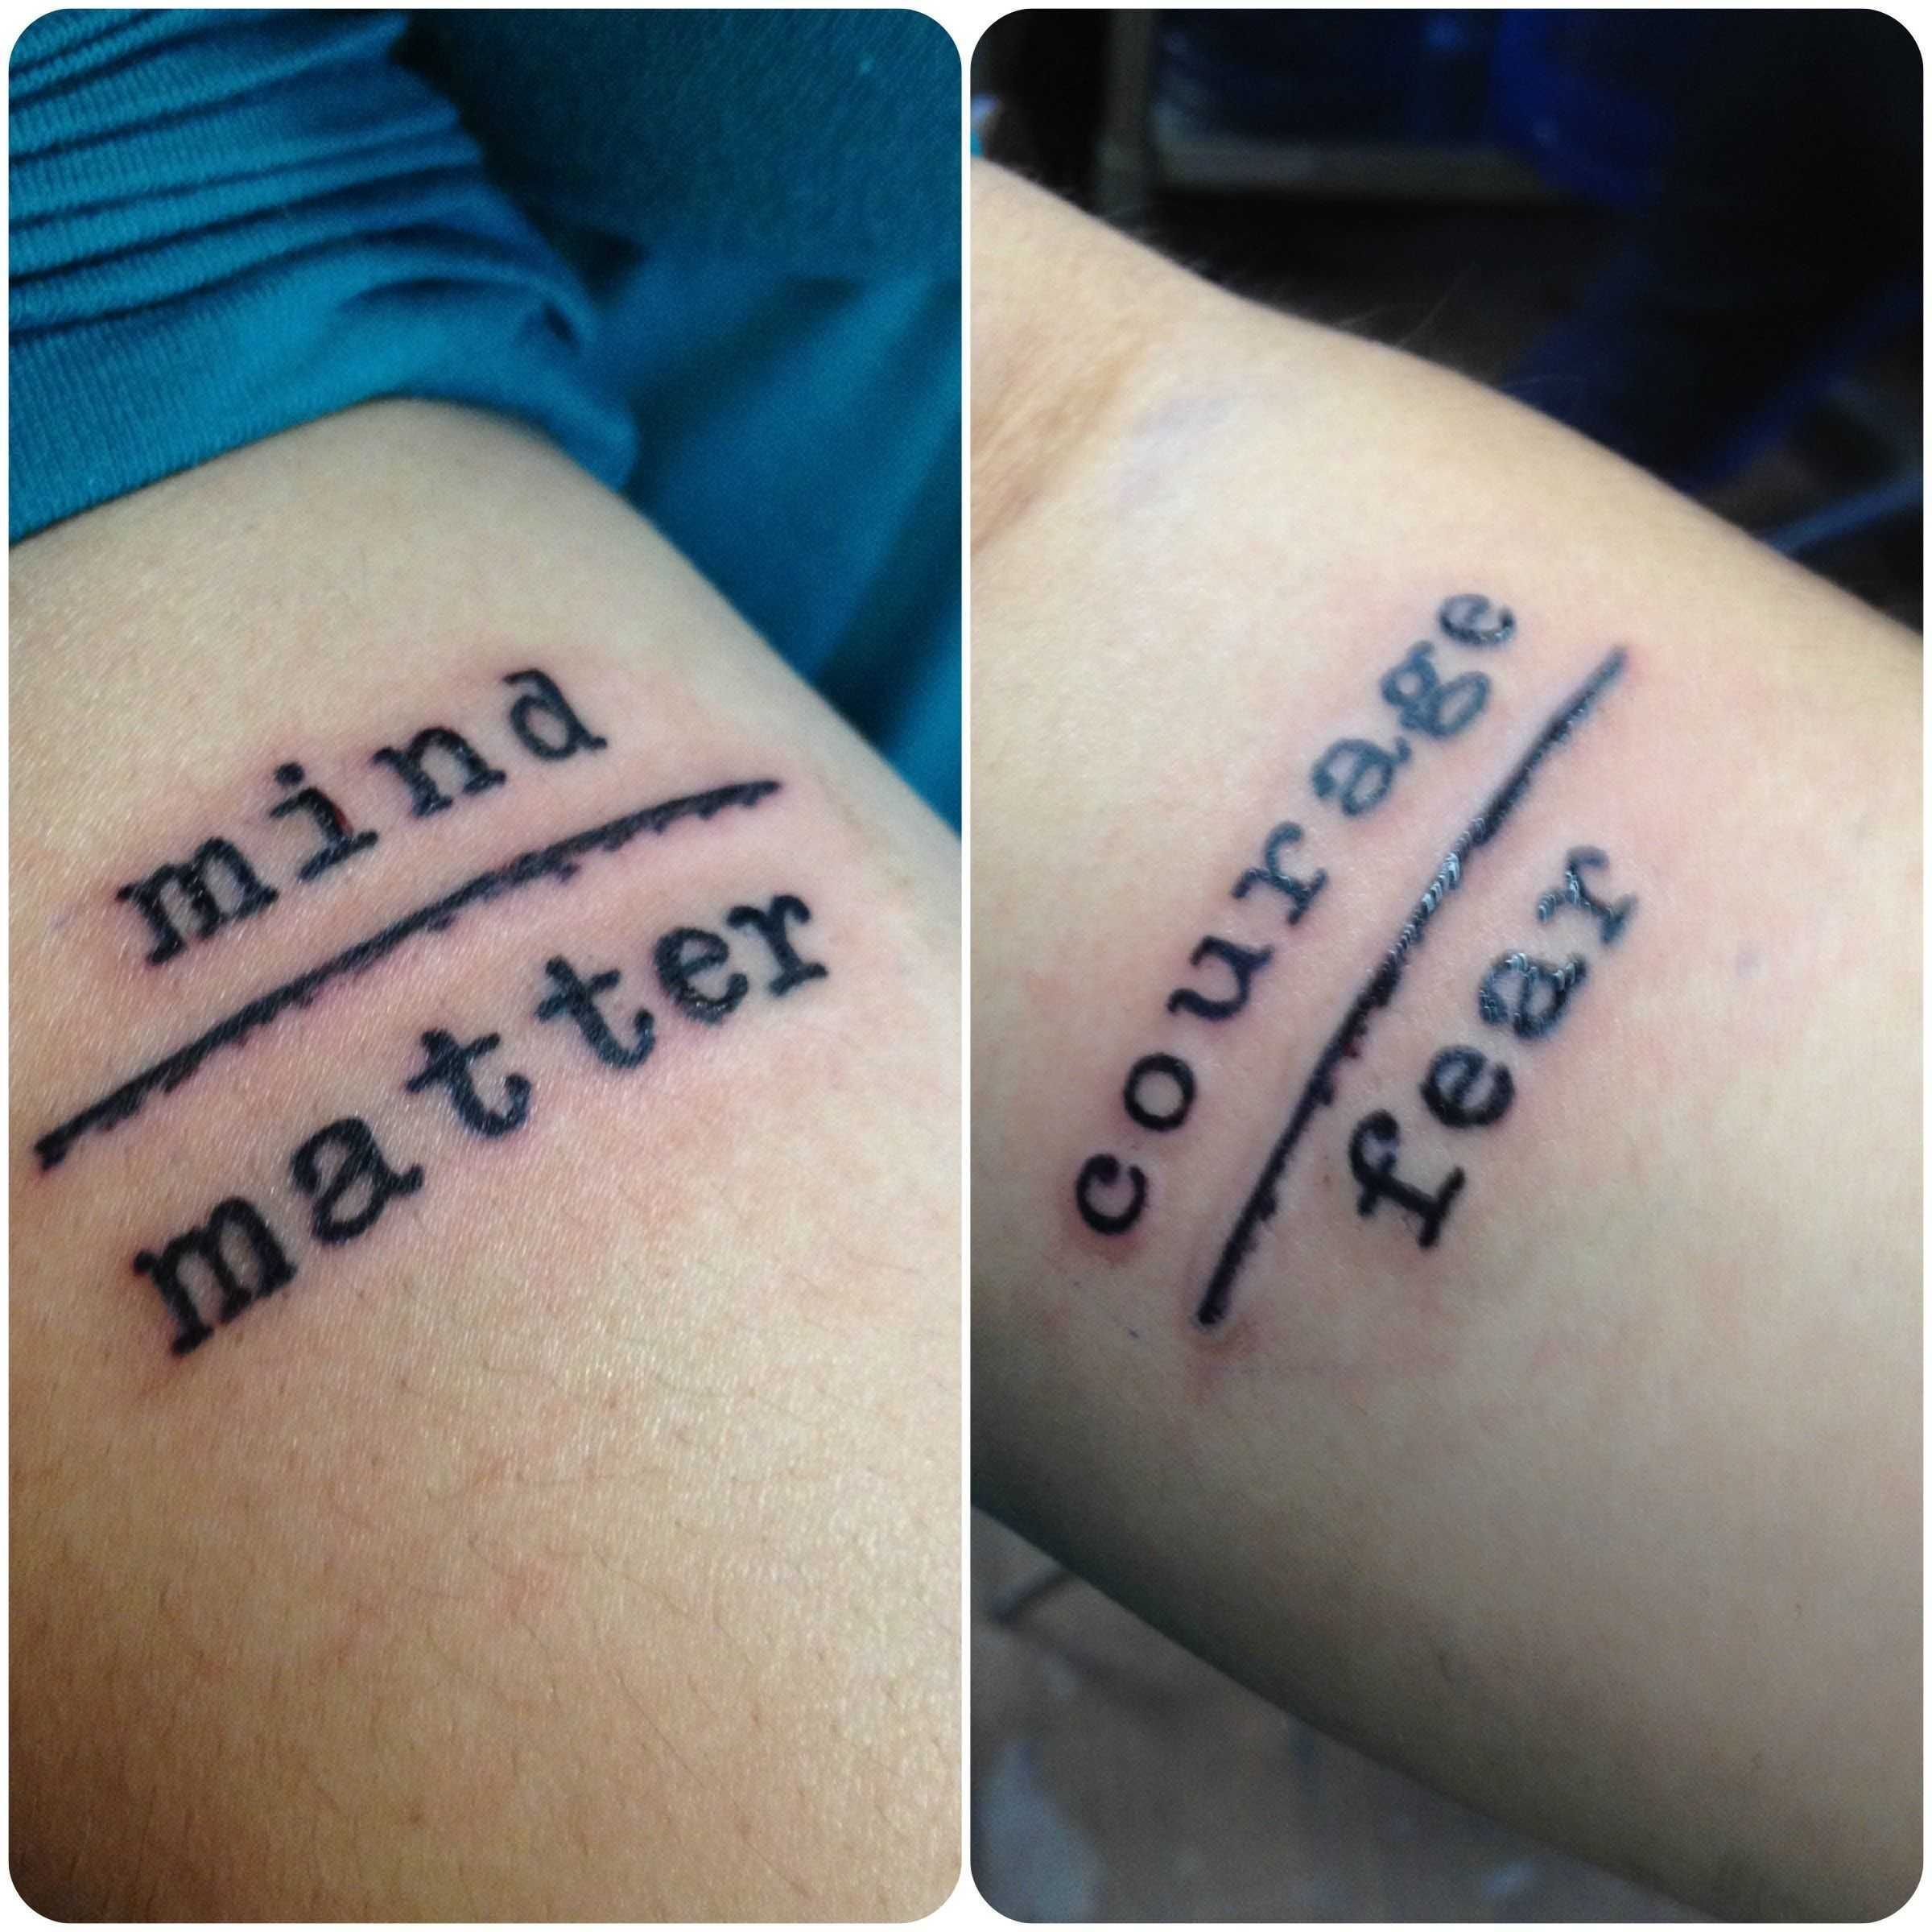 30 Inspiring Tattoo Ideas For Men With Creative Minds Manlikemarvinsparks Com Tattoo Font For Men Tattoos For Guys Inspirational Tattoos